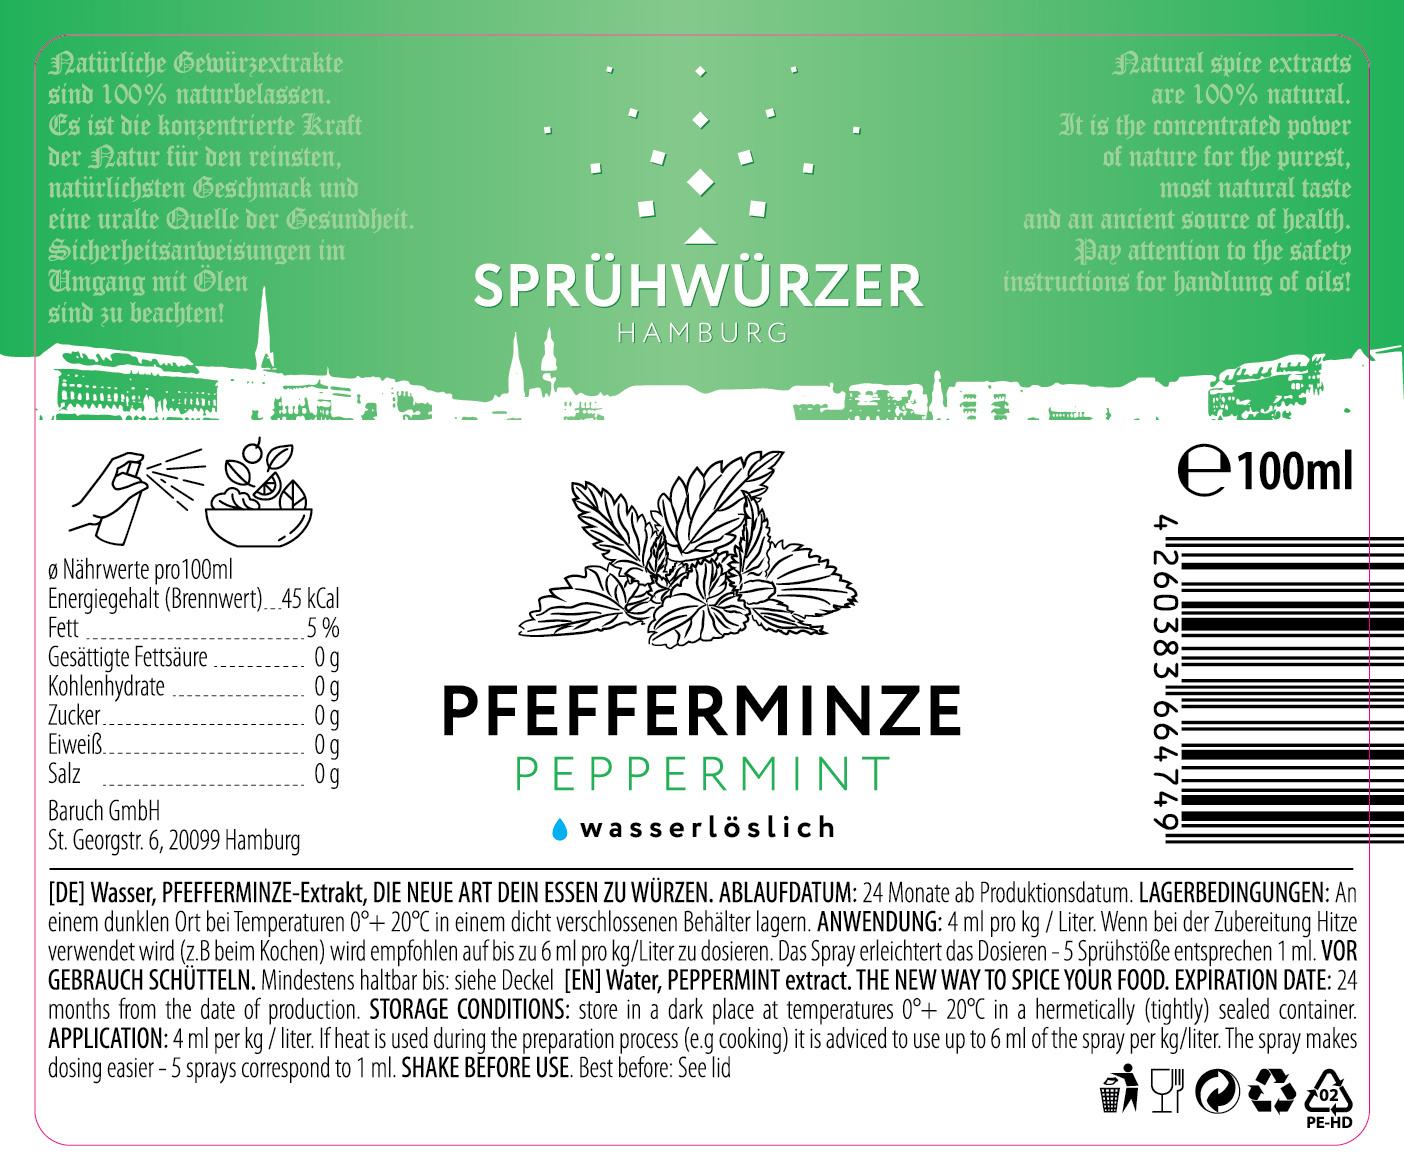 Pfefferminze-Extrakt 100ml